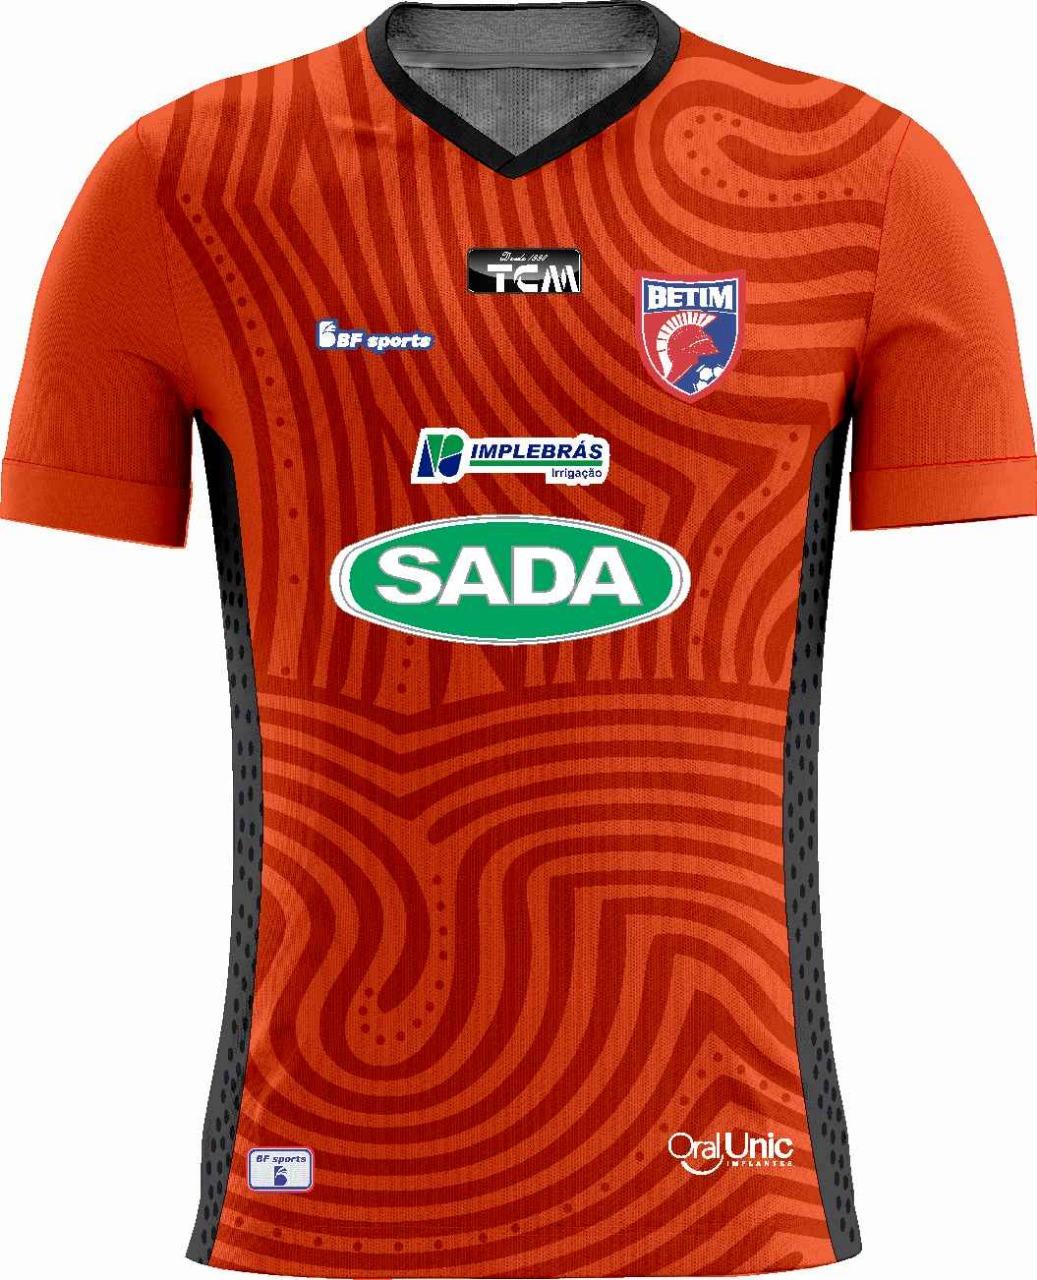 Camisa Of. Betim Futebol Mod.2 GOLEIRO Feminina 2021